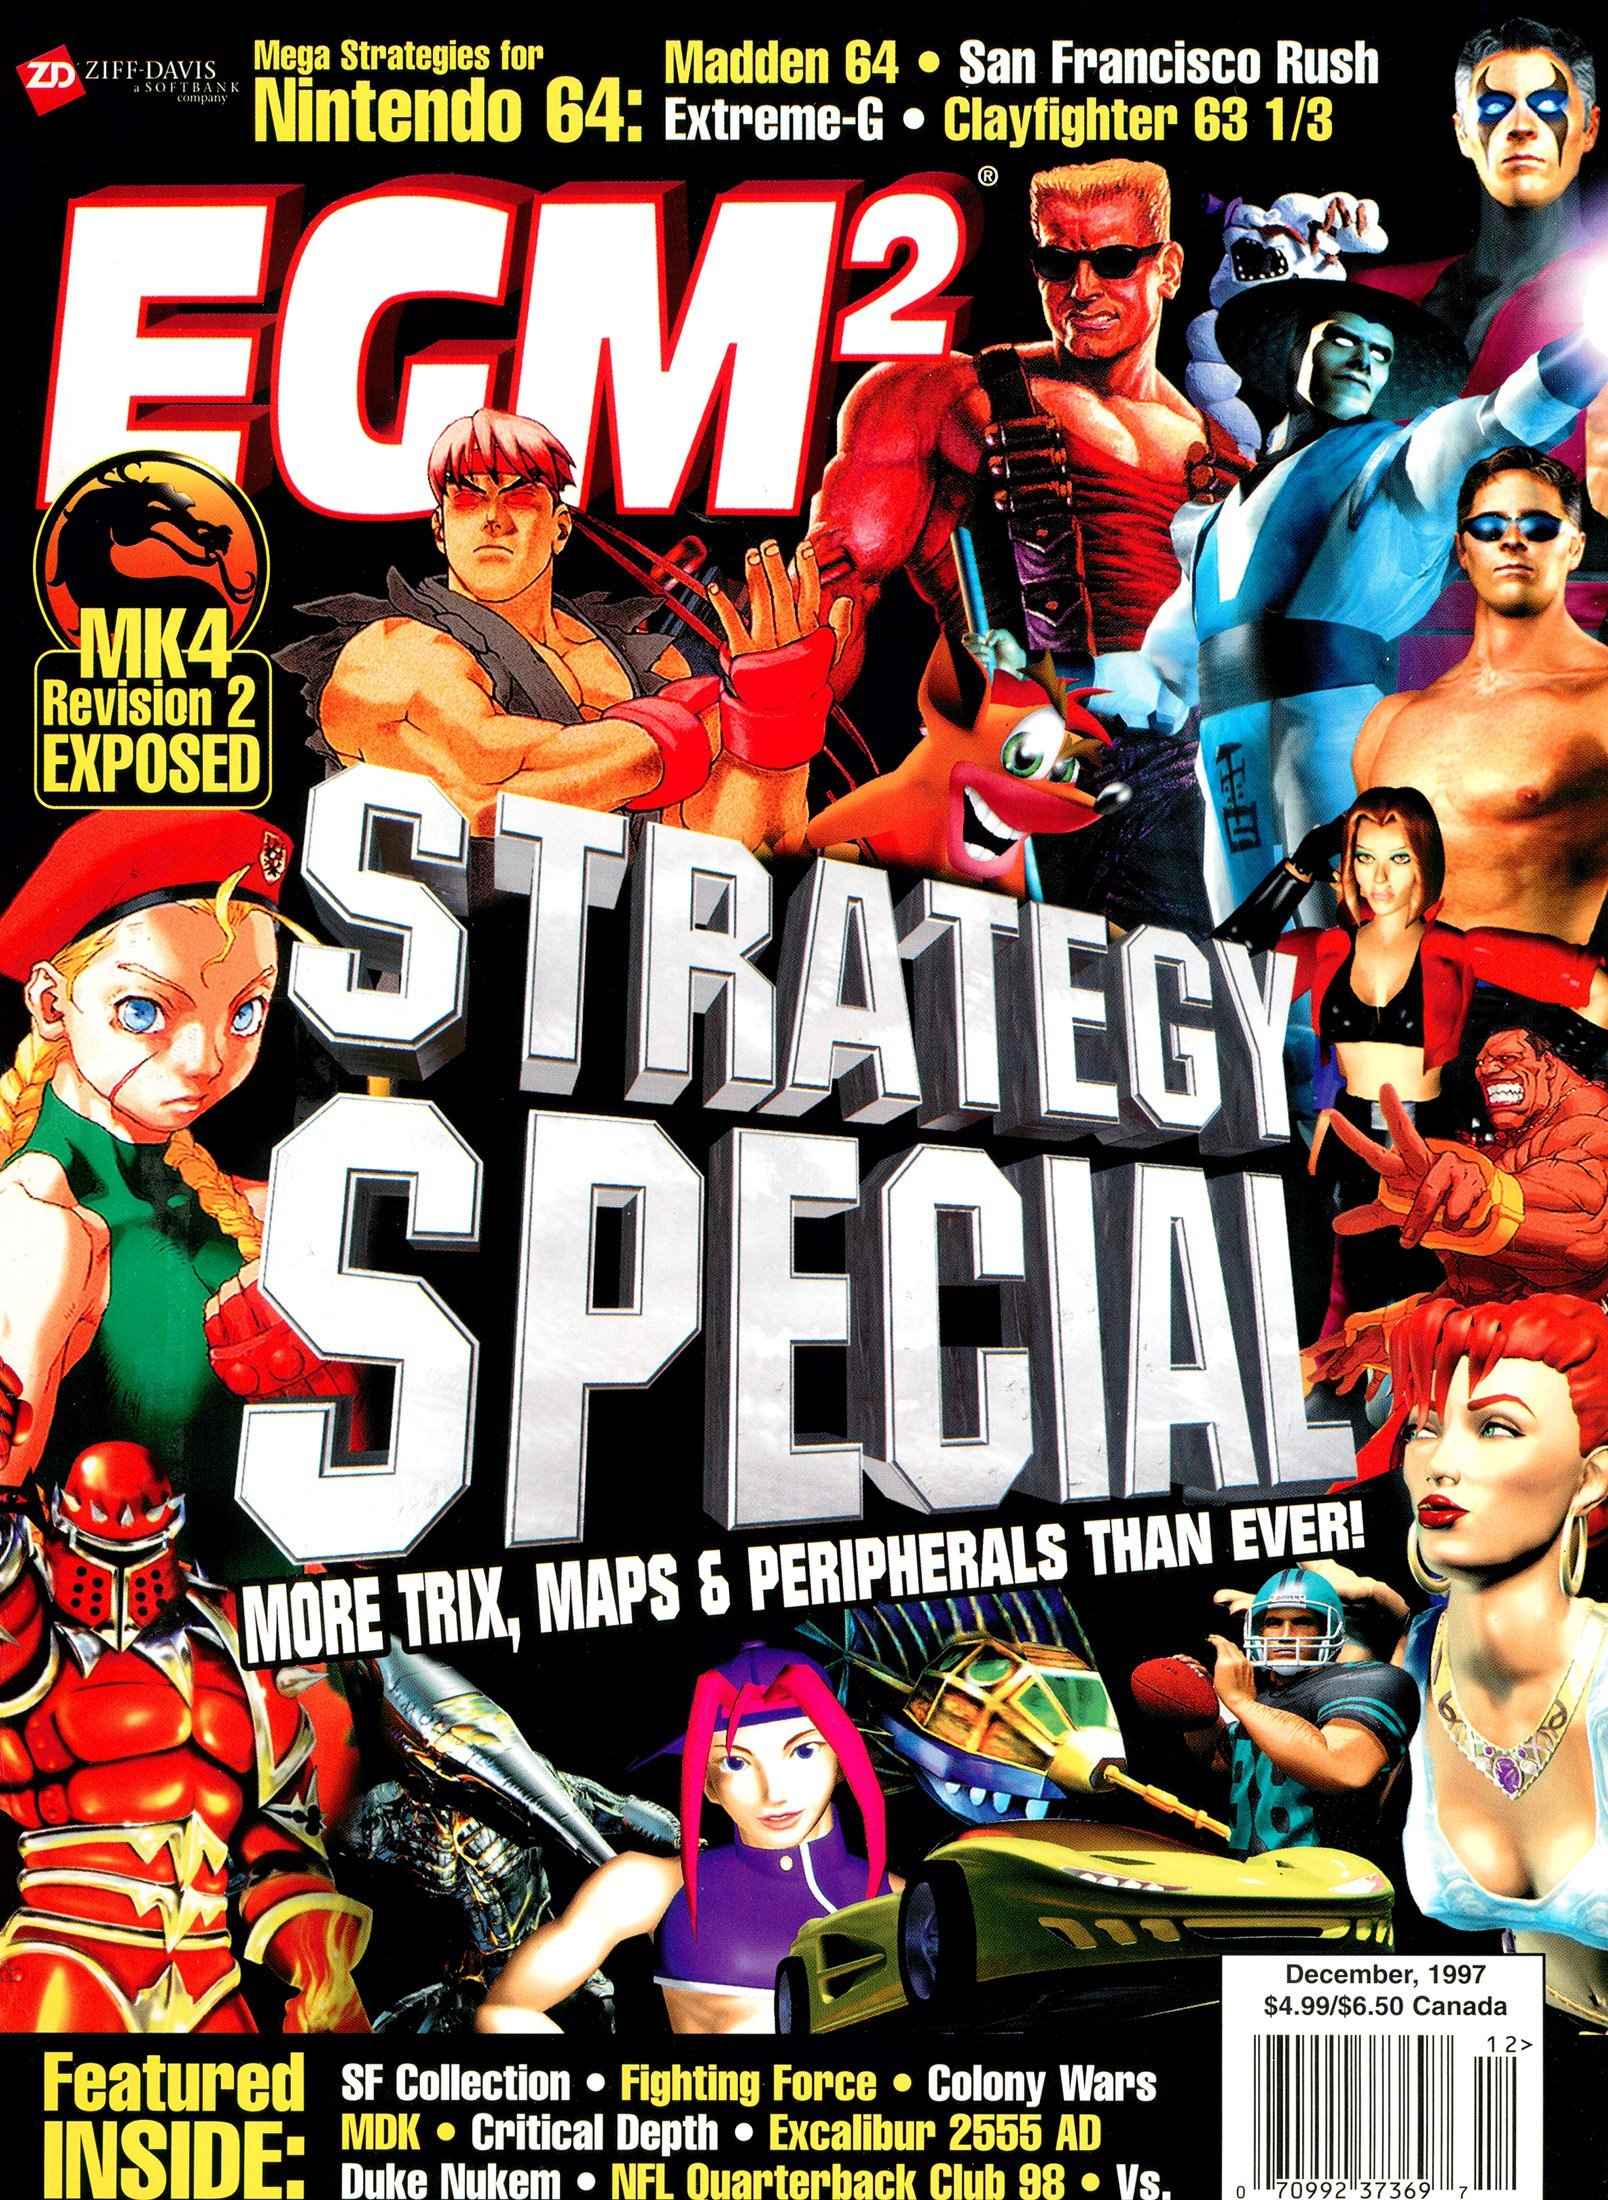 EGM2 Issue 42 (December 1997)